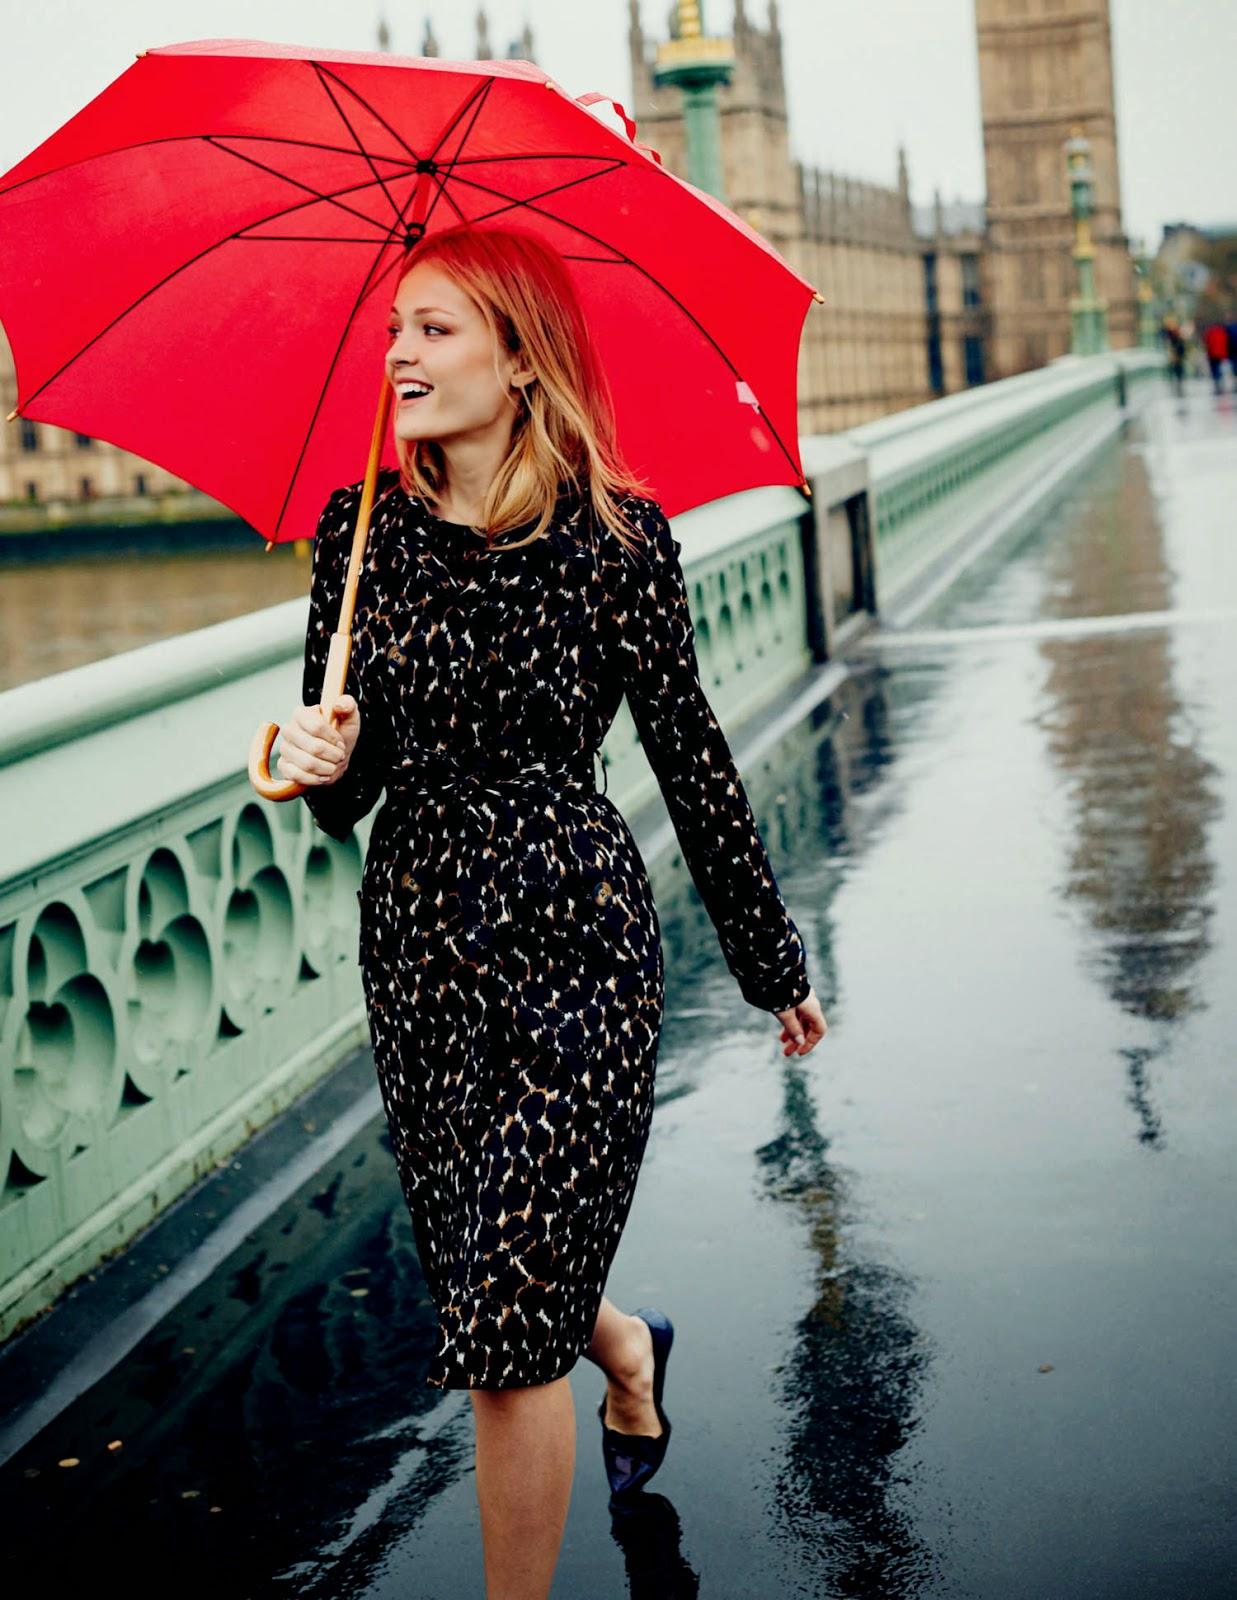 Boden umbrella raining London Big Ben